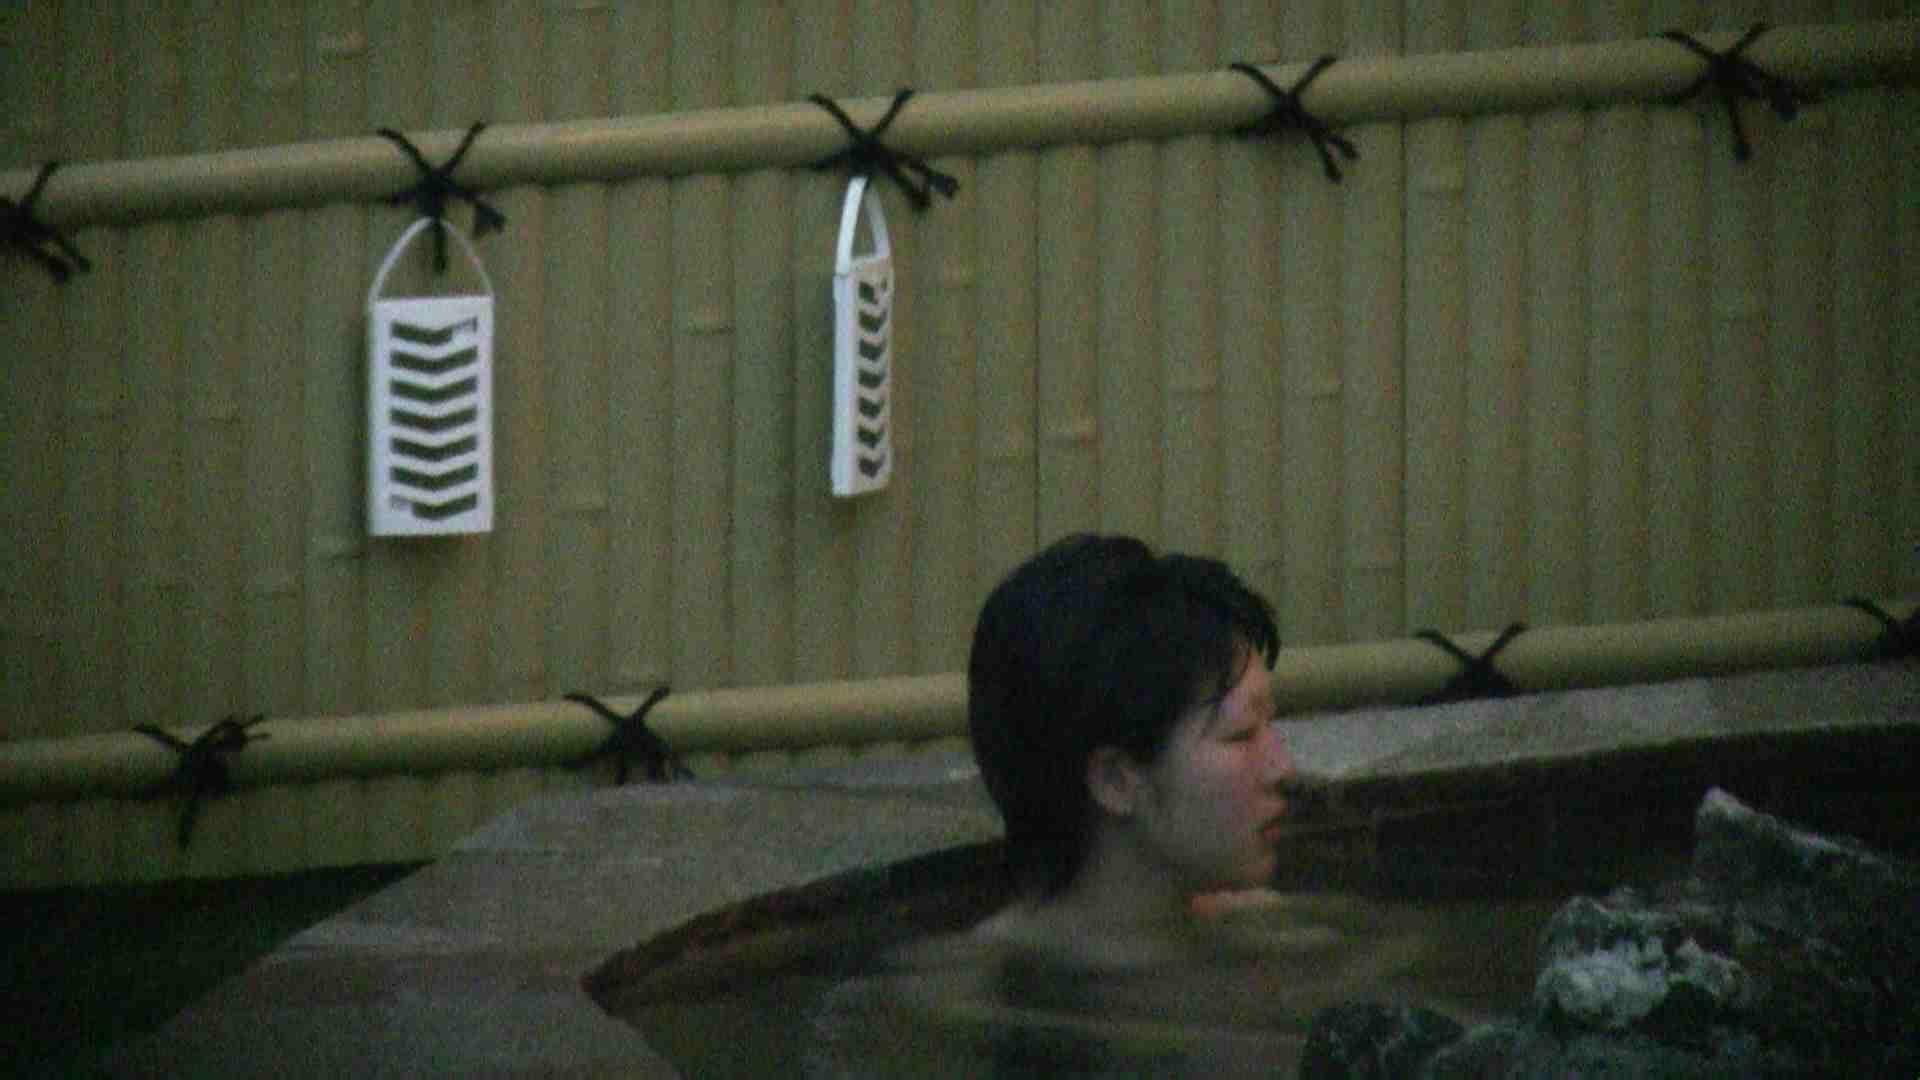 Aquaな露天風呂Vol.05【VIP】 盗撮大放出 エロ画像 65連発 31